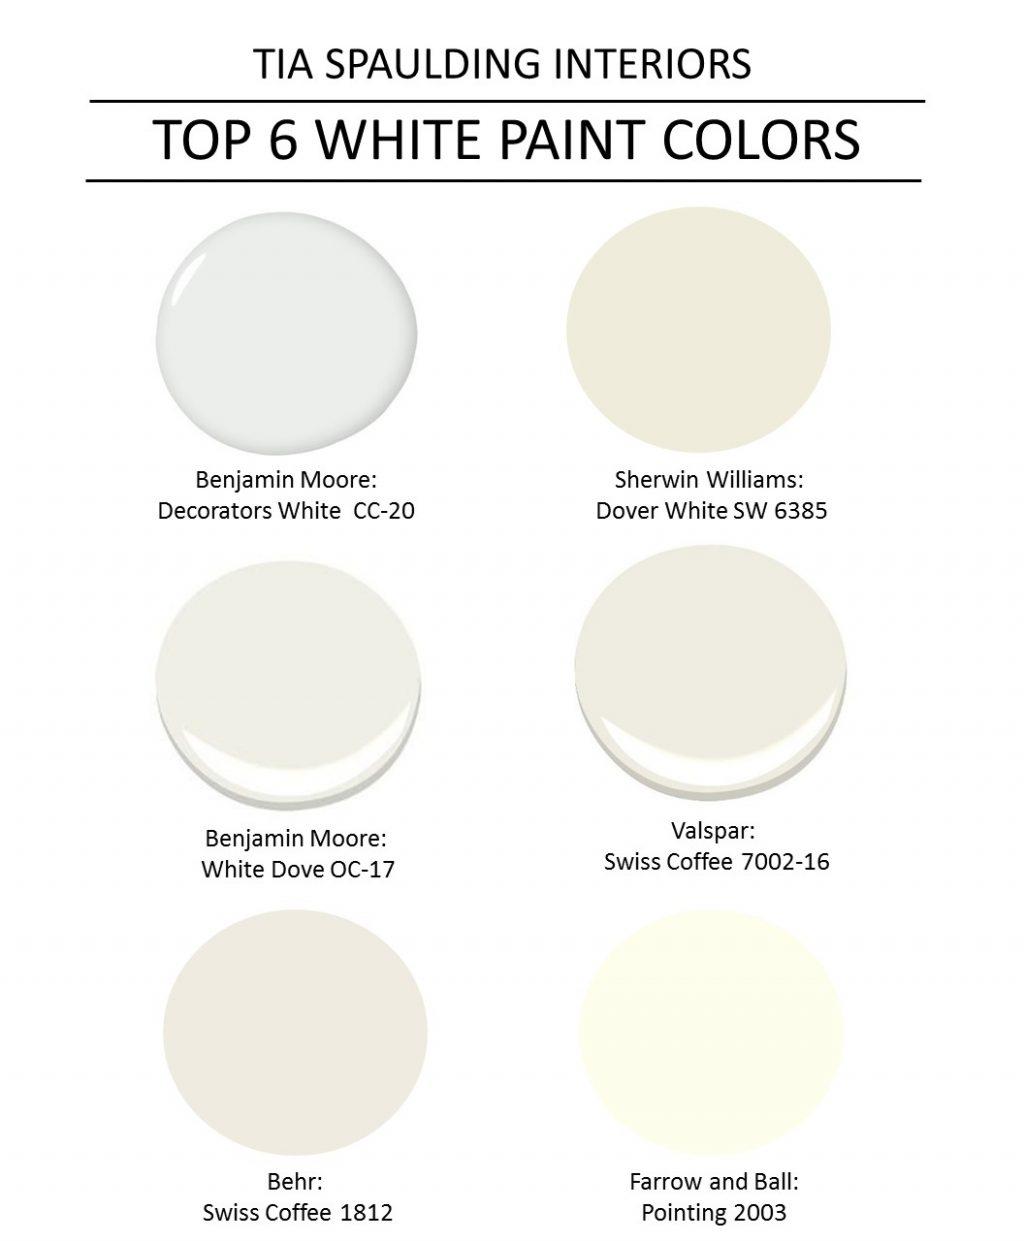 Breathtaking Tsi Six Paint Colors Sherwin Williams Dover Trim Sherwin Williams Dover Ceiling houzz-03 Sherwin Williams Dover White